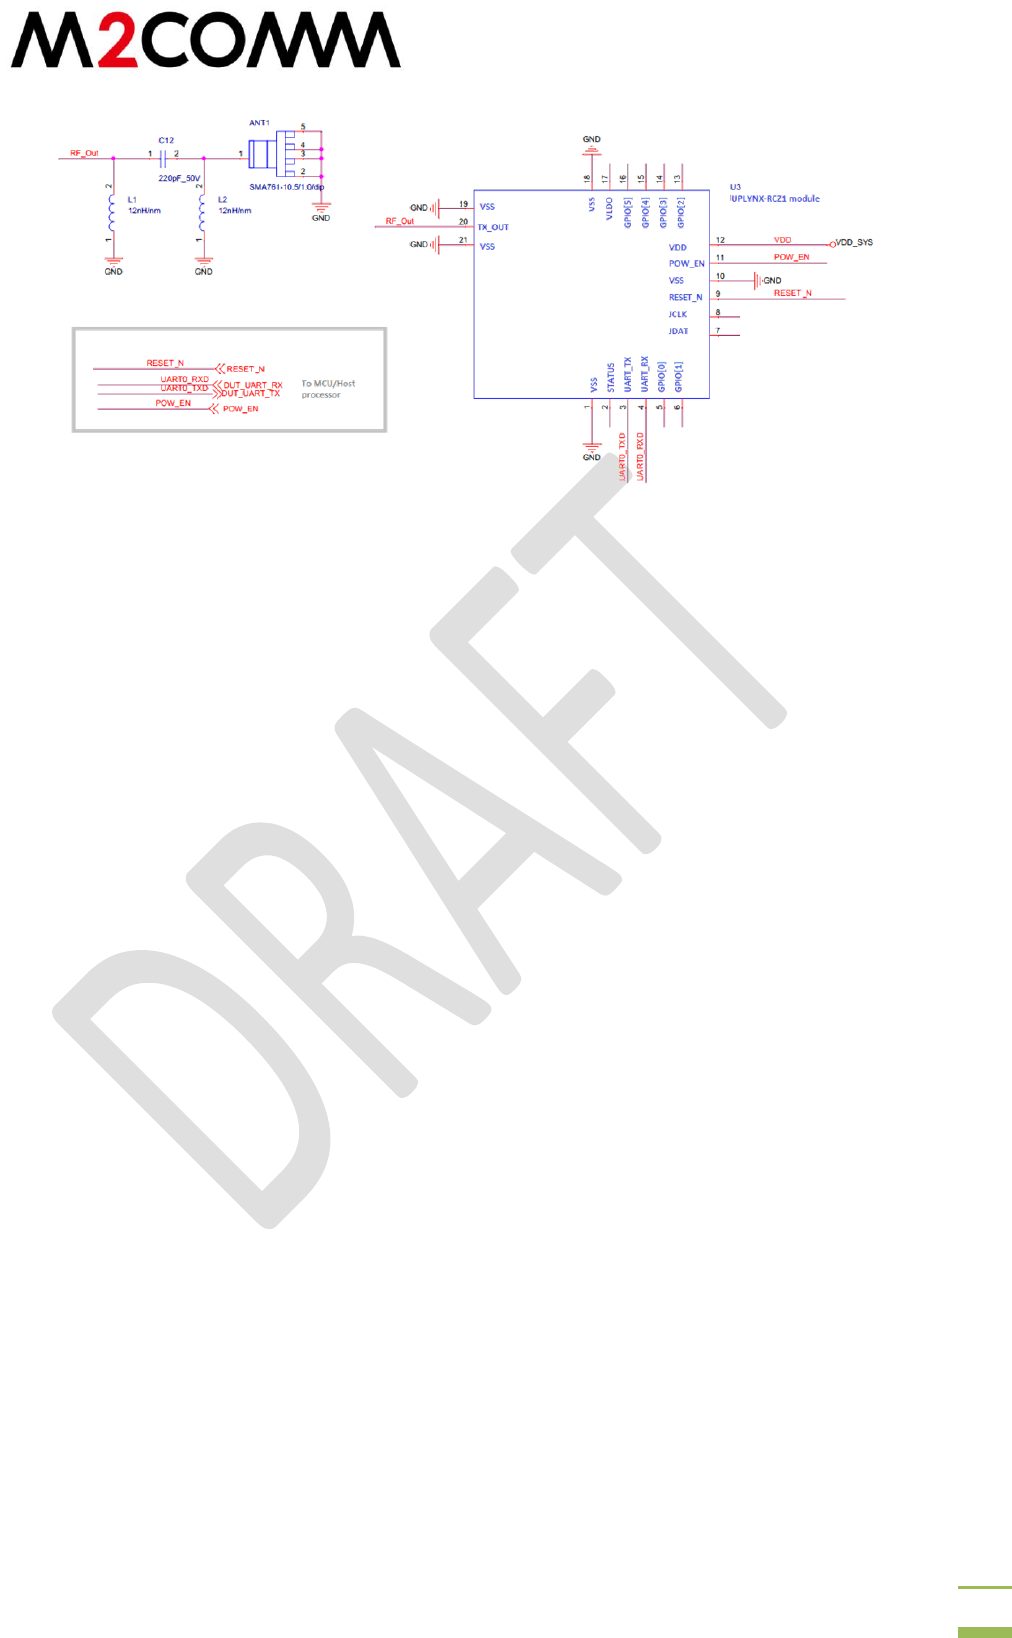 M2Communication 8001UX36LDRZ24 Sigfox Verified Uplynx